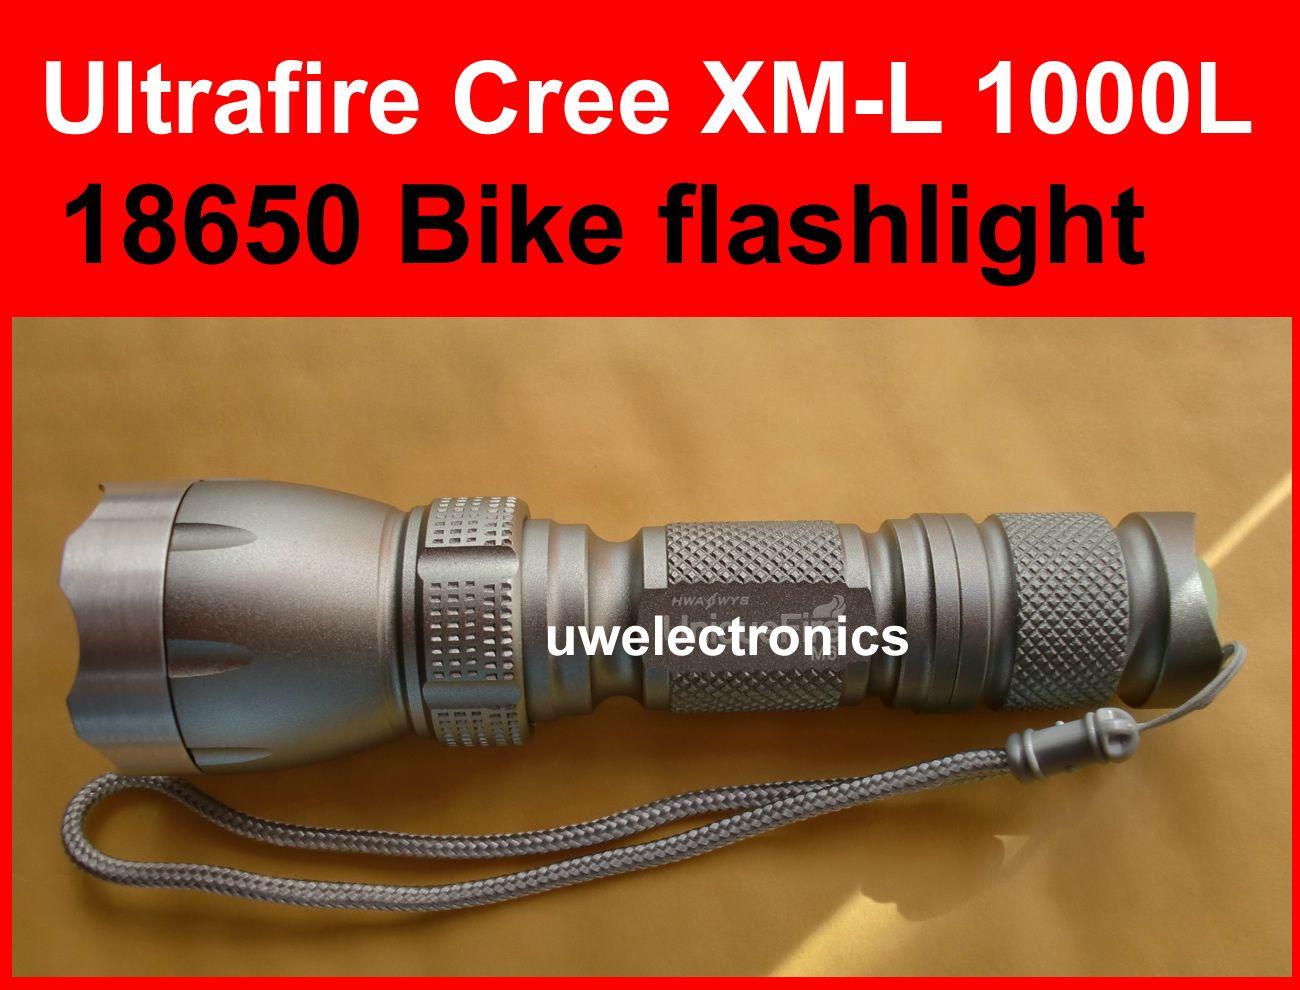 10W SSC P7 900Lライトランプ1000 Lumen Cree LED CREE XM-L T6 LED SSC P7-D Ultrafire懐中電灯TORCH 900 LUNMENS